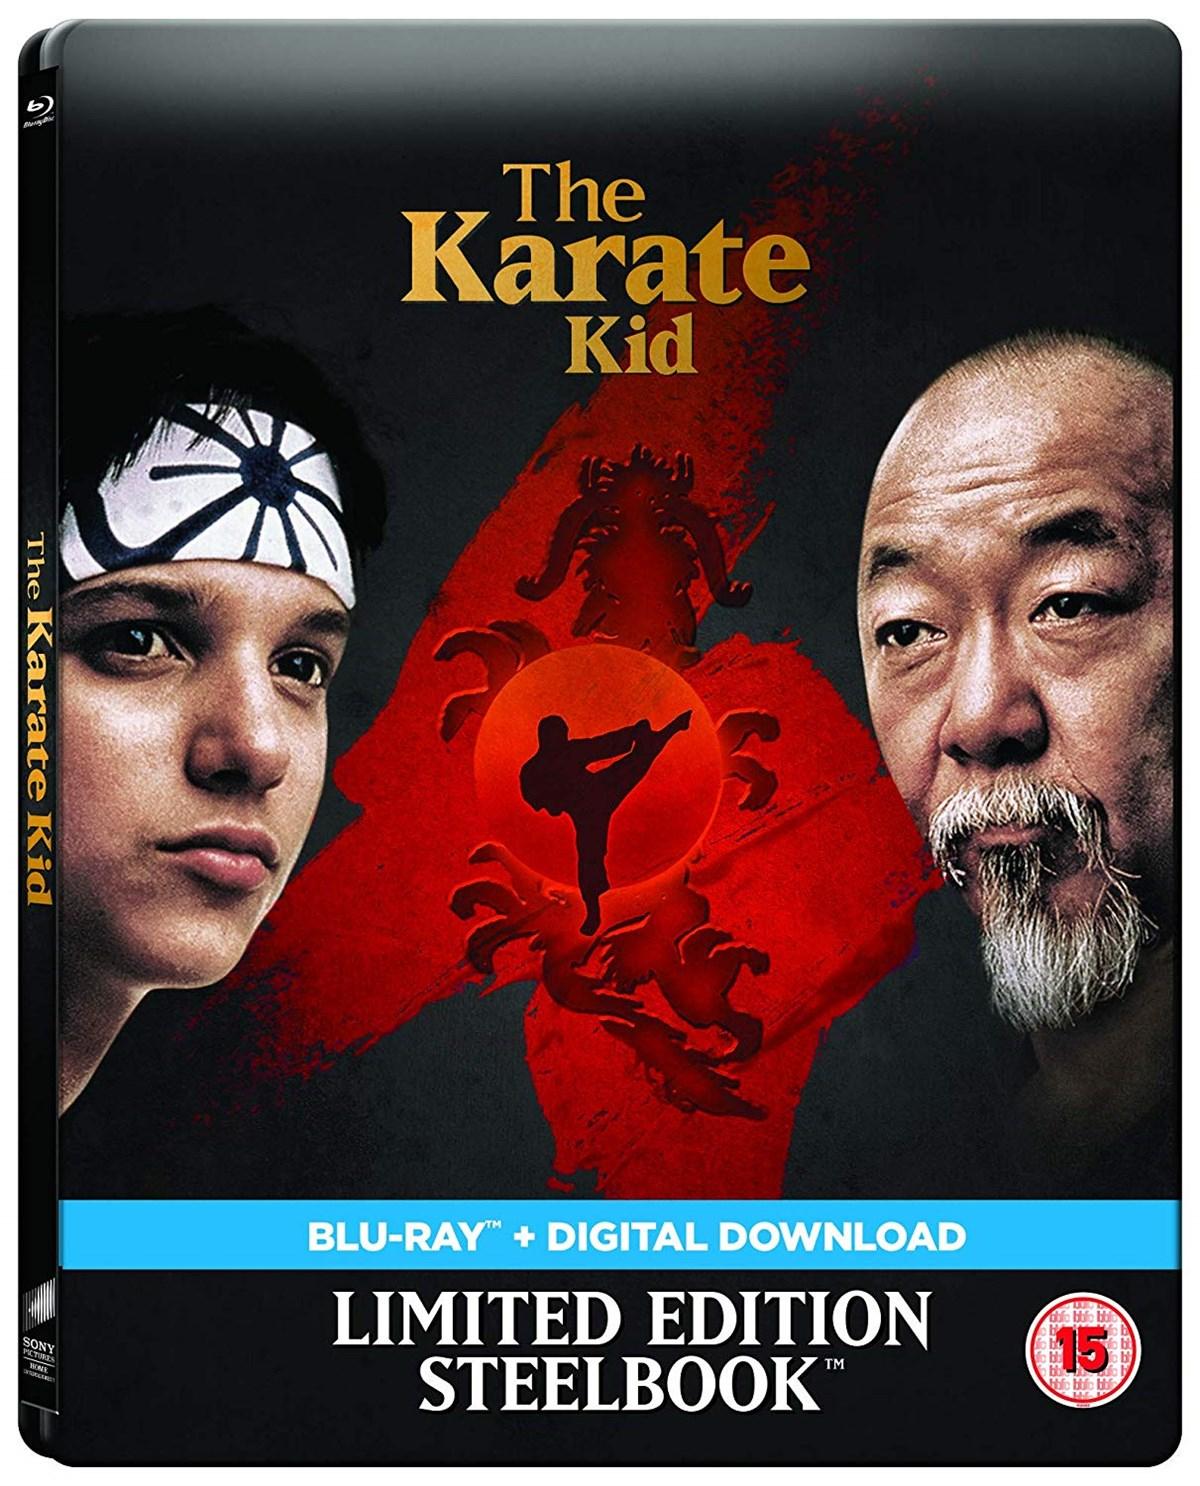 The Karate Kid (1984) (Limited Edition Steelbook) [Blu-ray] £4.99 @ zoom.co.uk